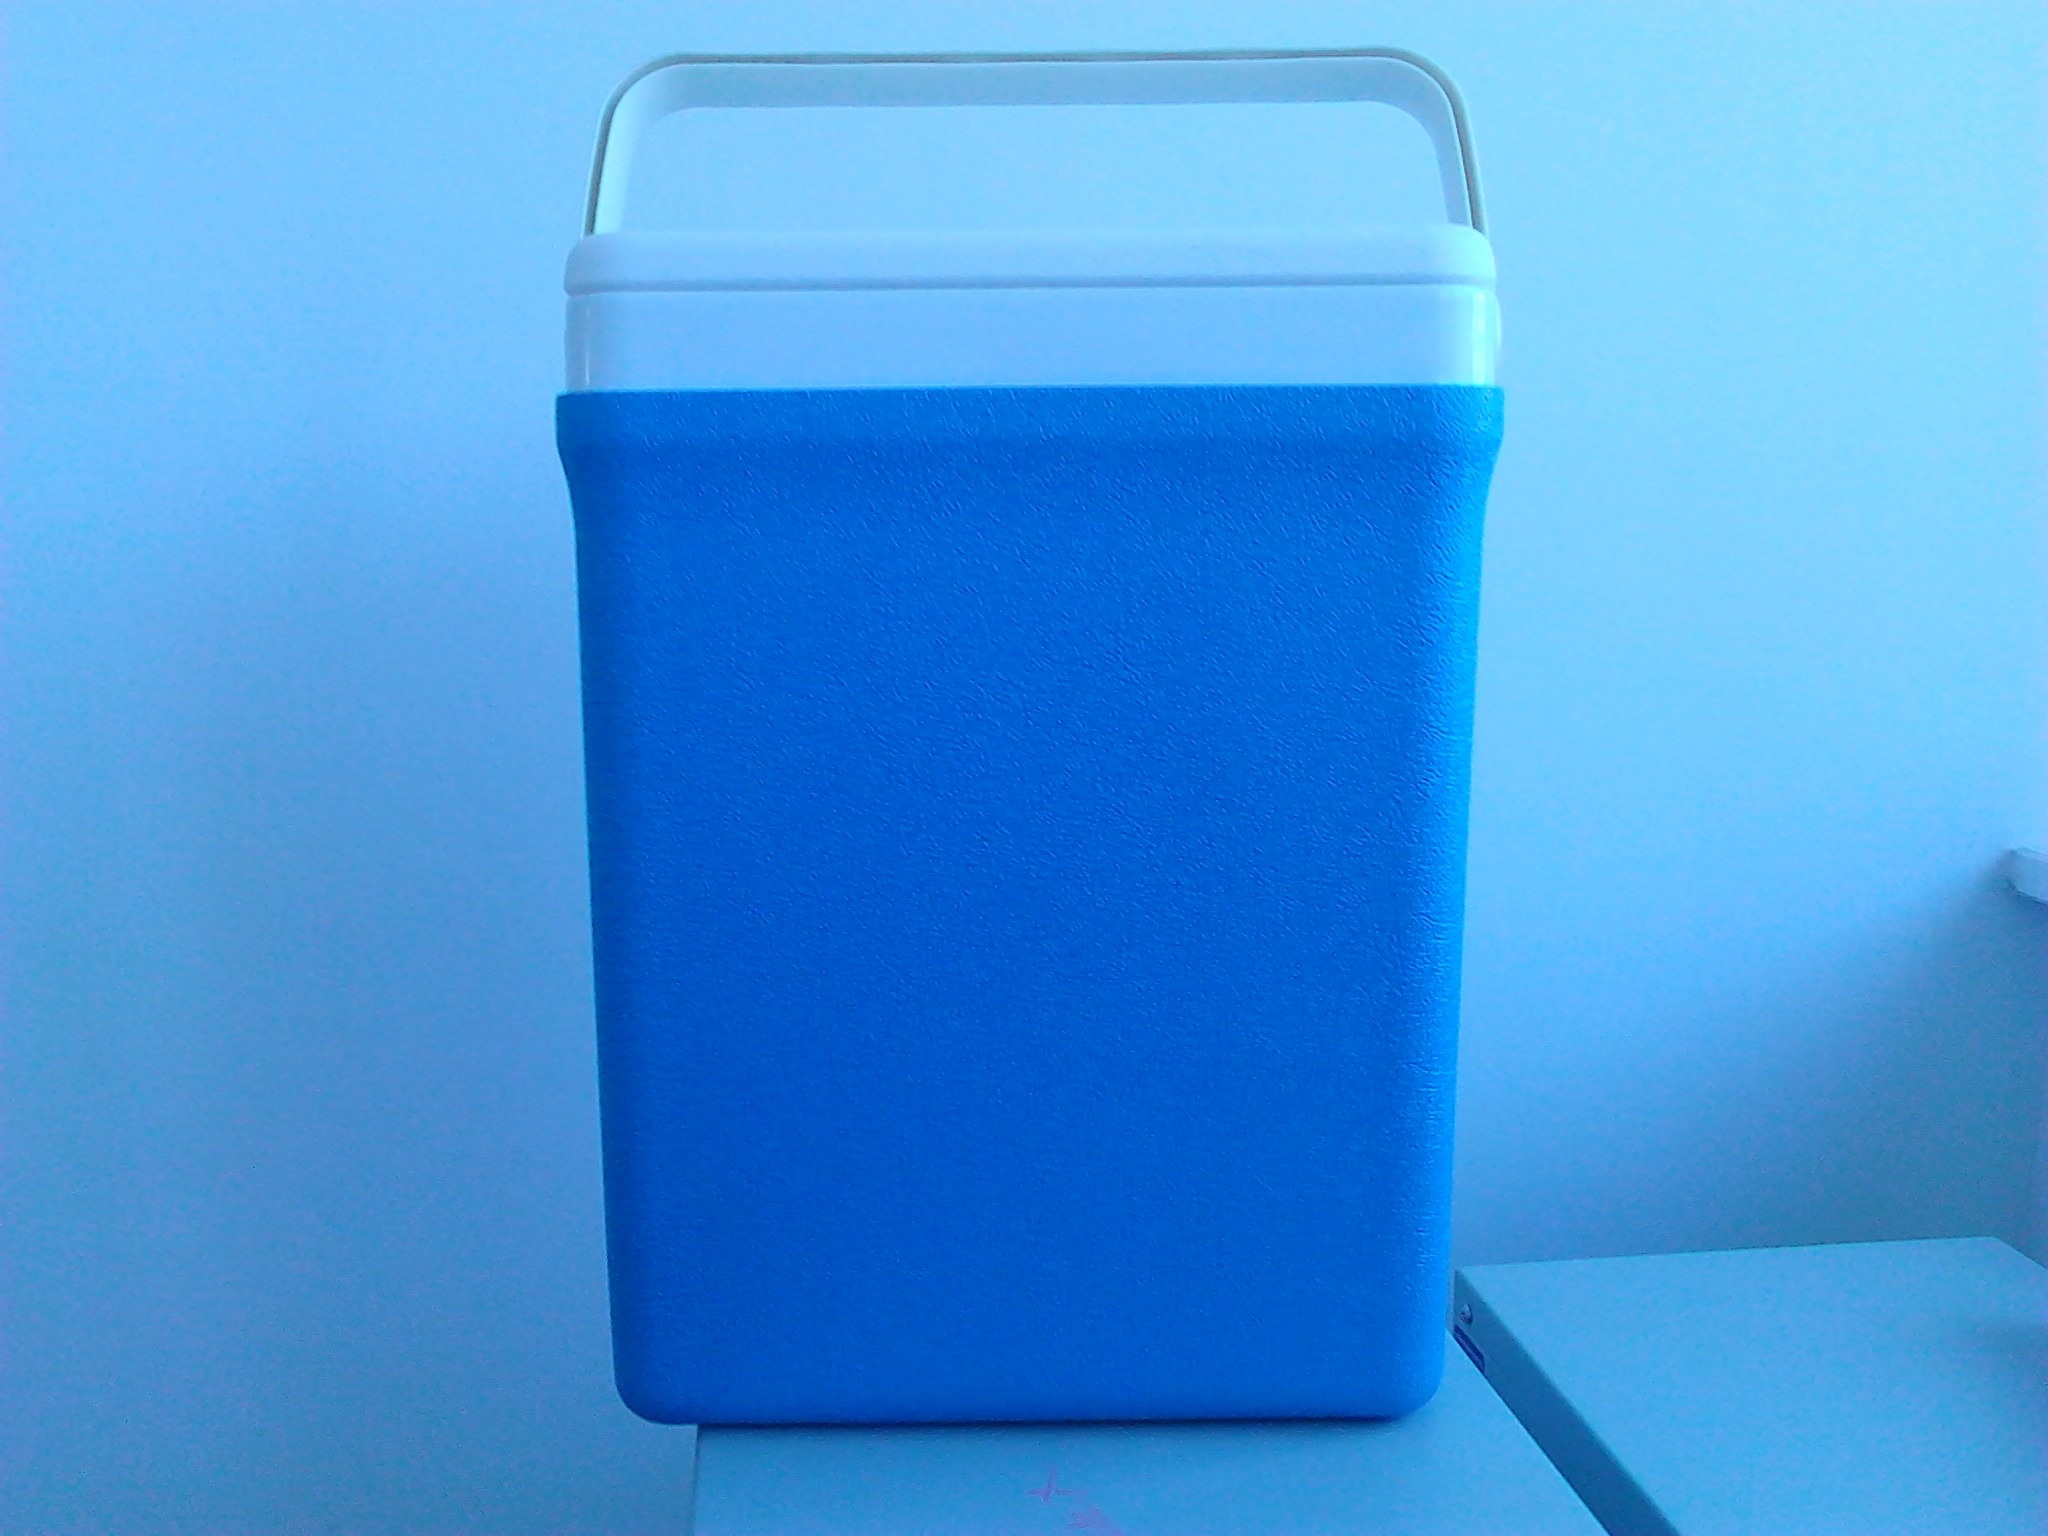 Mini Kühlschrank Für Camper : Kompressor kühlbox test v v mini kühlschränke für unterwegs